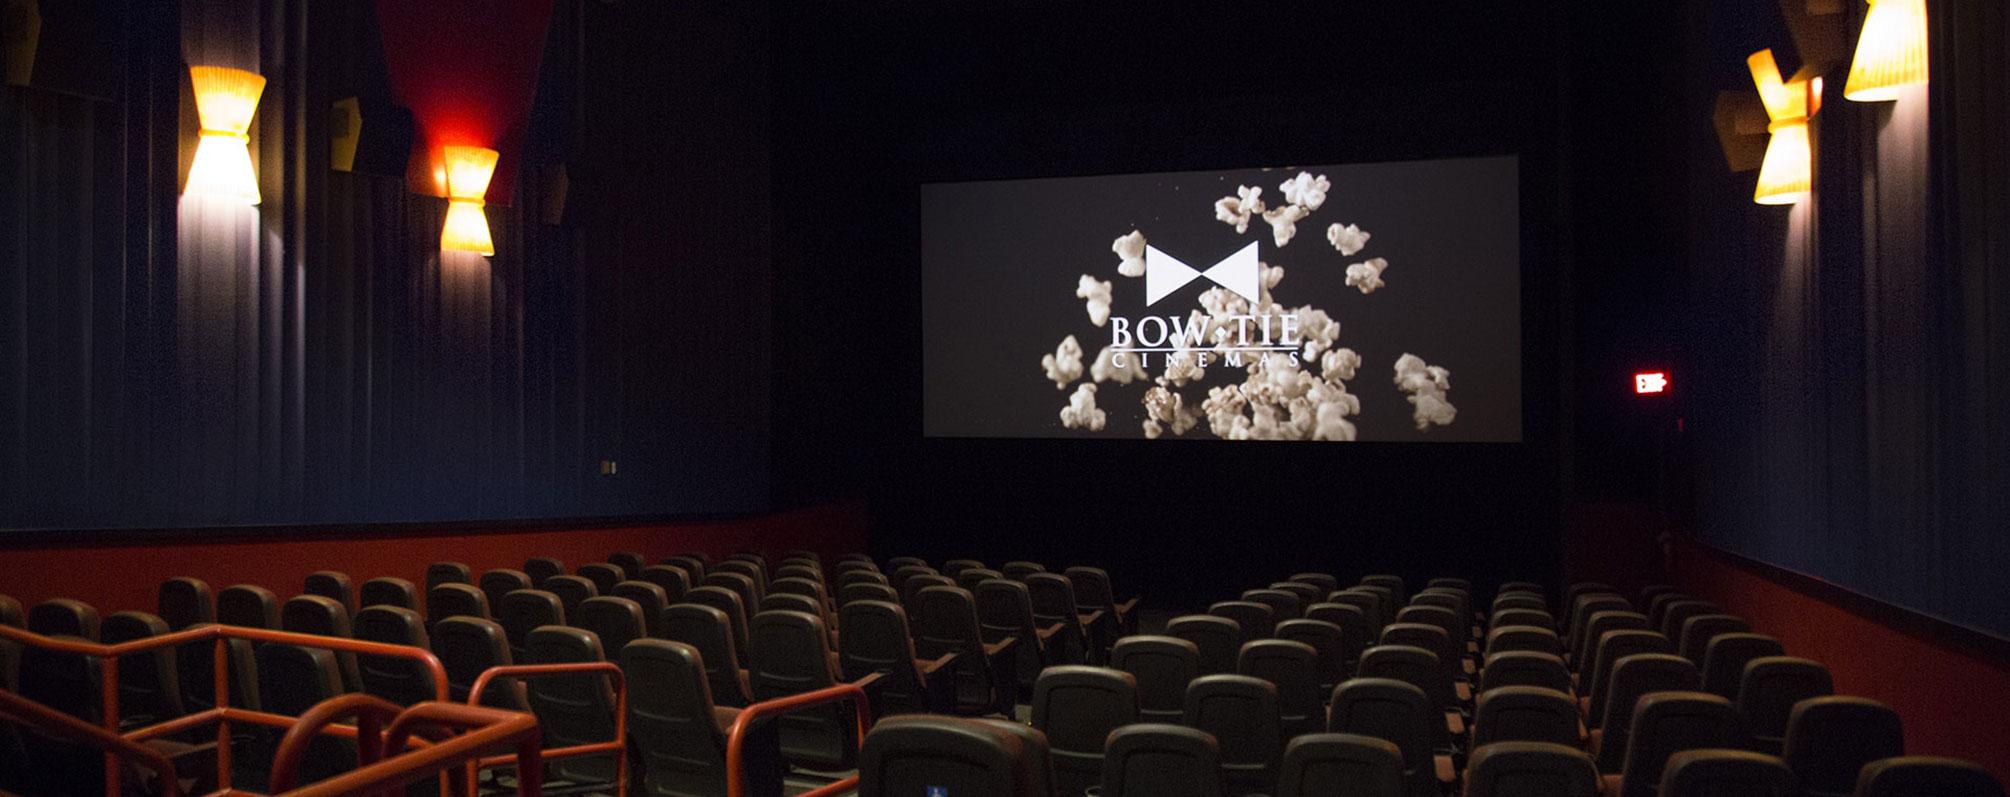 bow tie cinema annapolis photo - 1